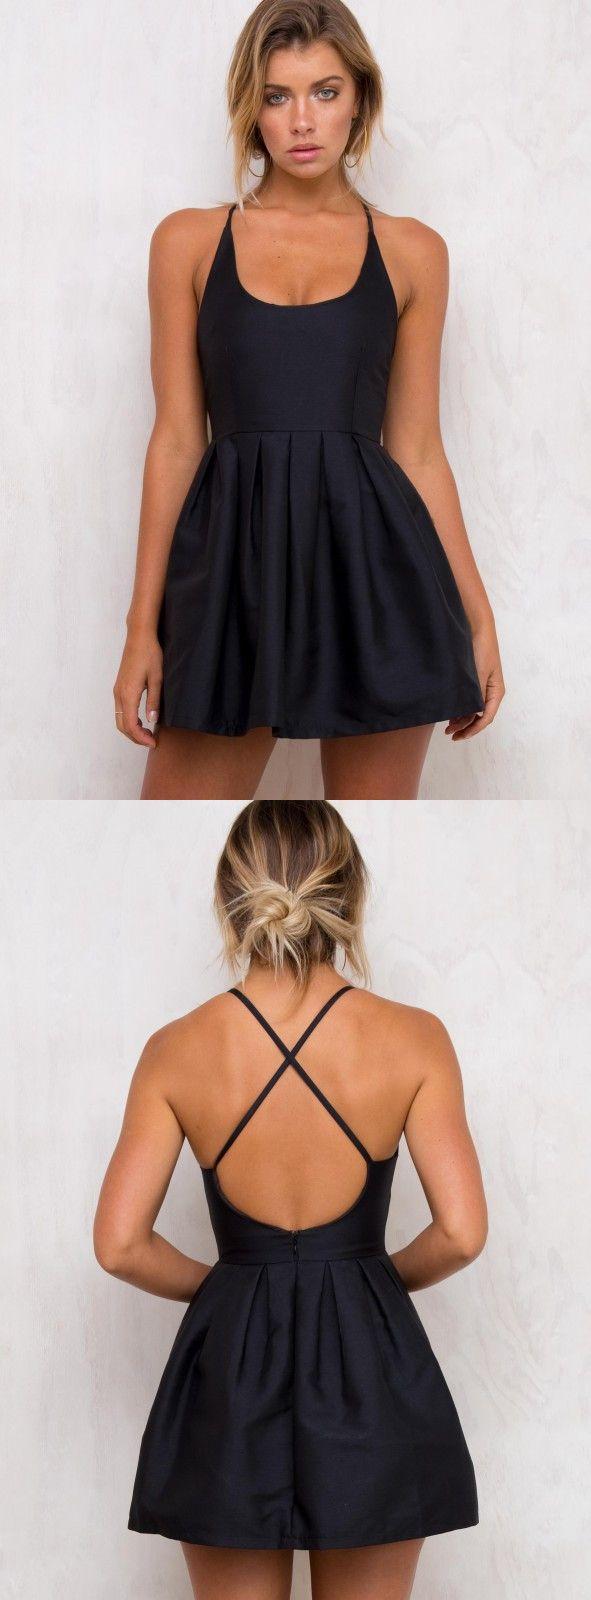 Little black dress short homecoming dress black short homecoming